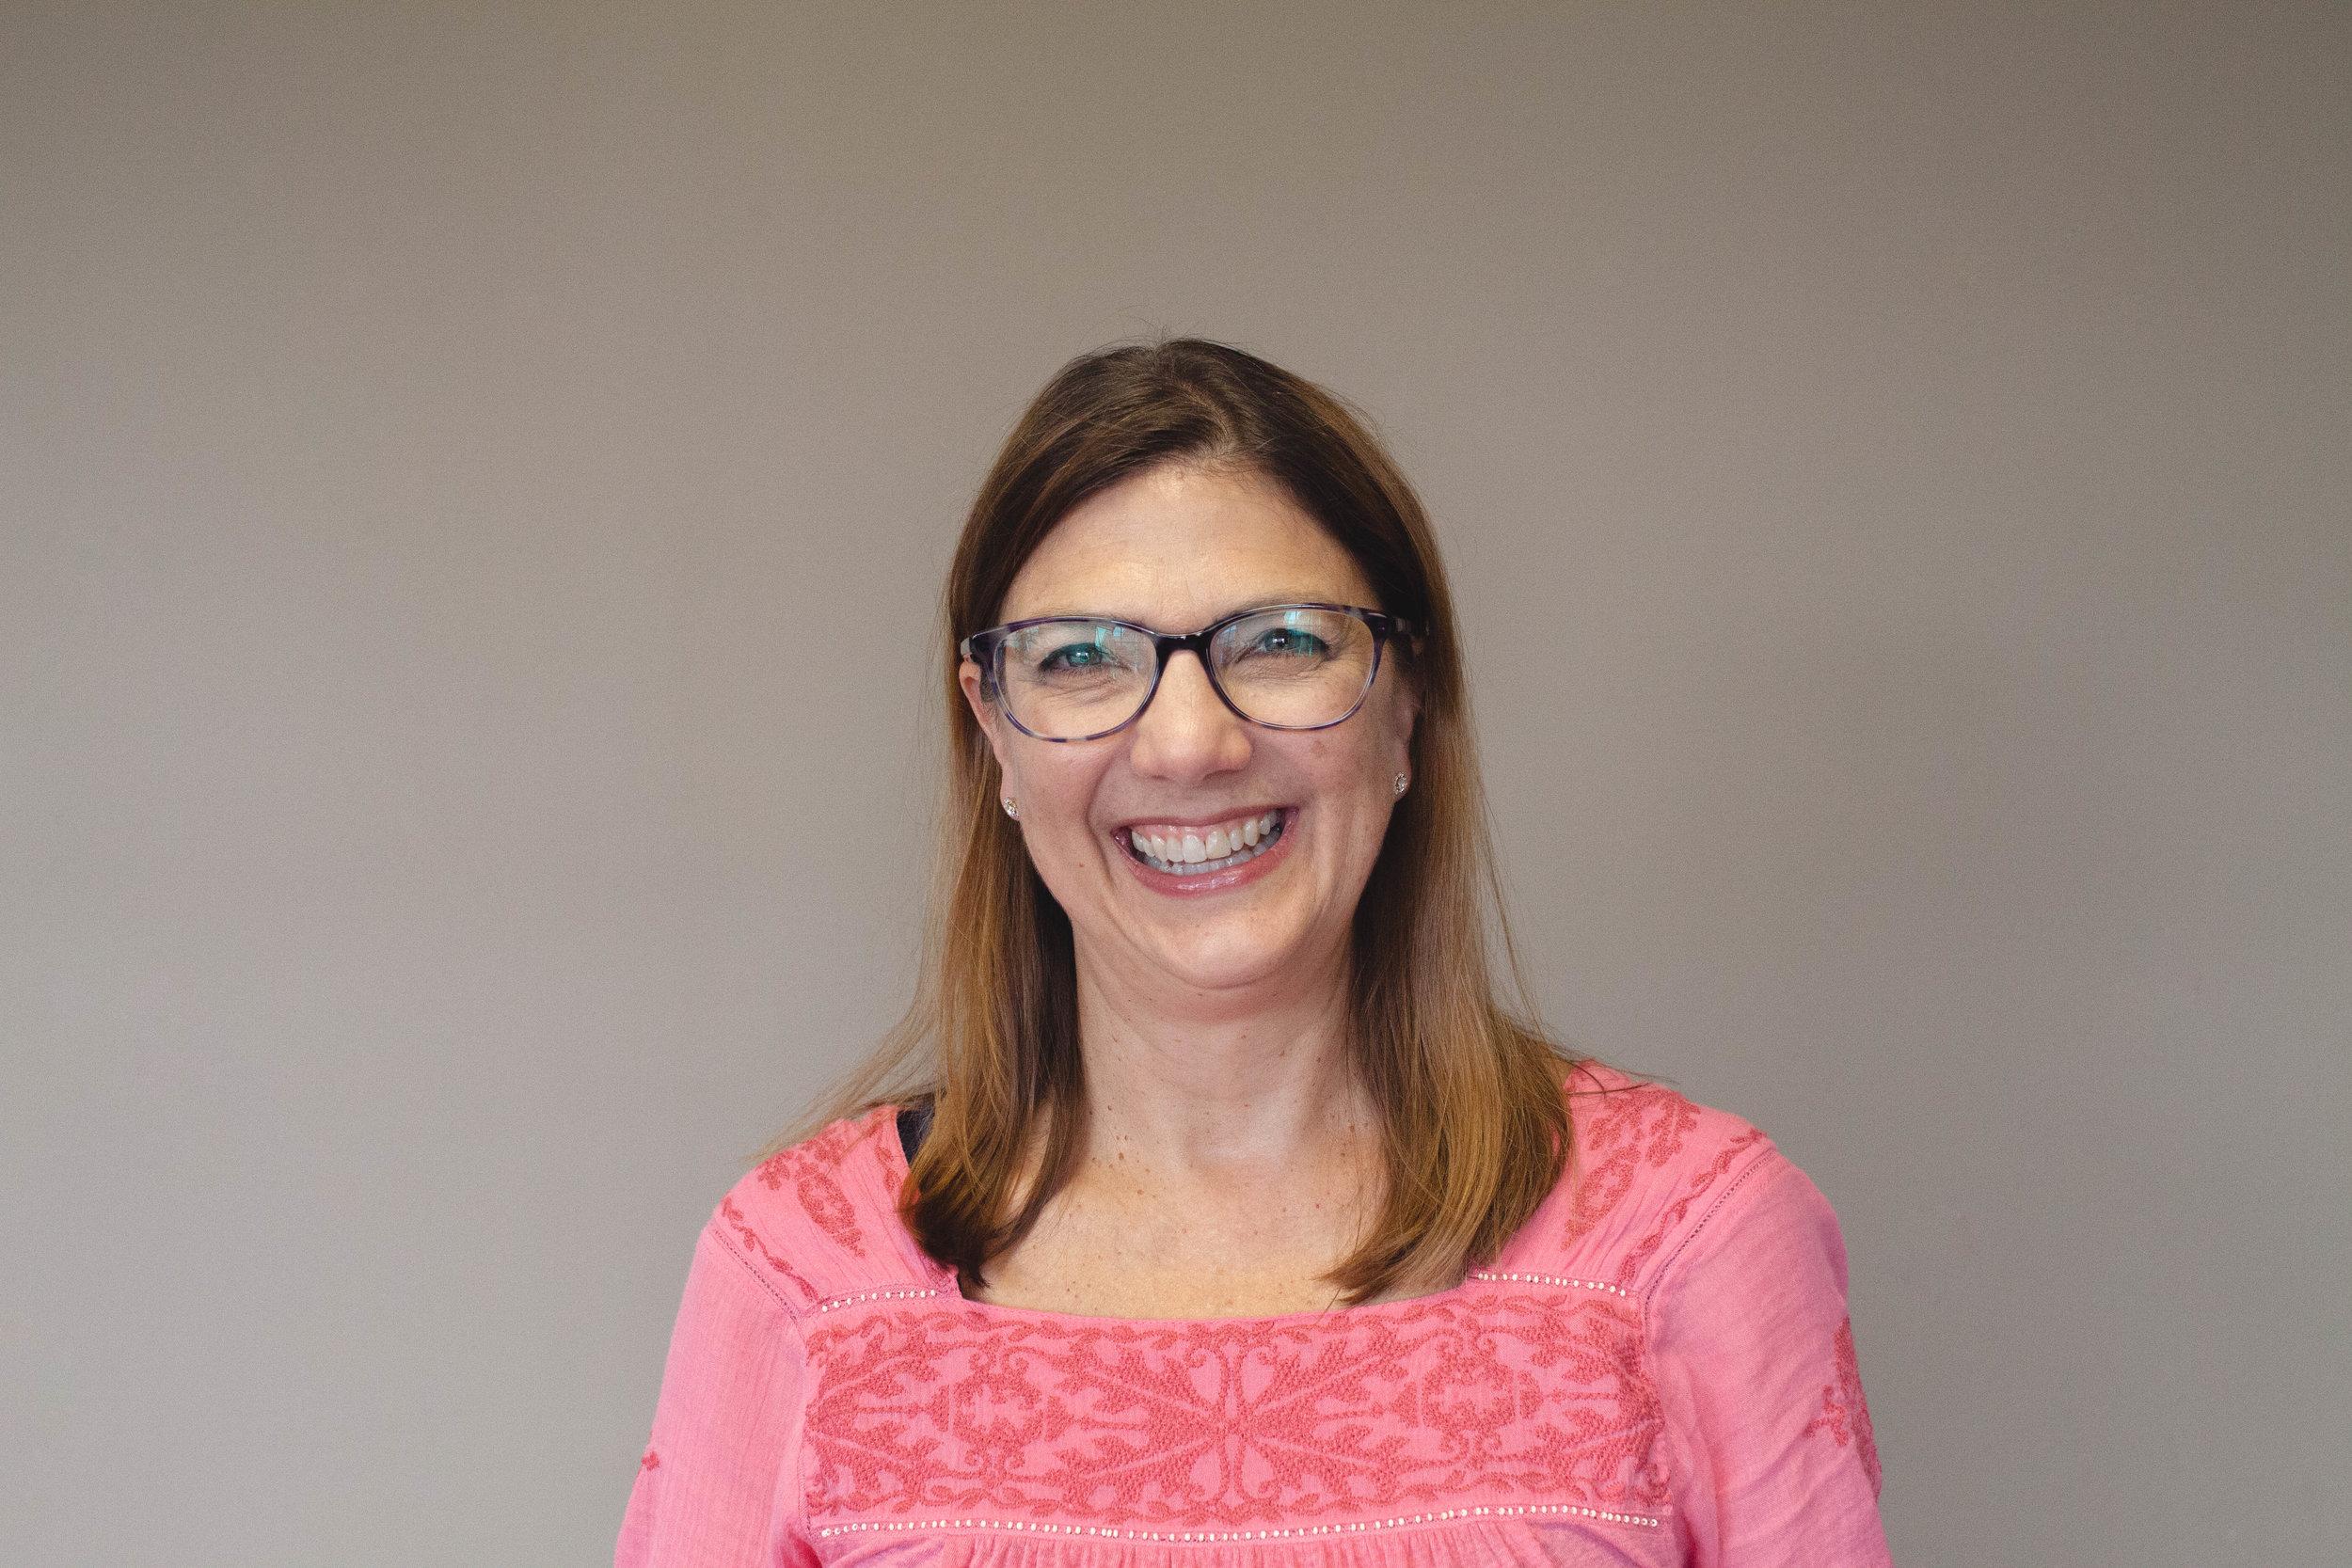 Have questions about Faith Preschool? - Ask Stephanie Fisher, our Faith Preschool Director!